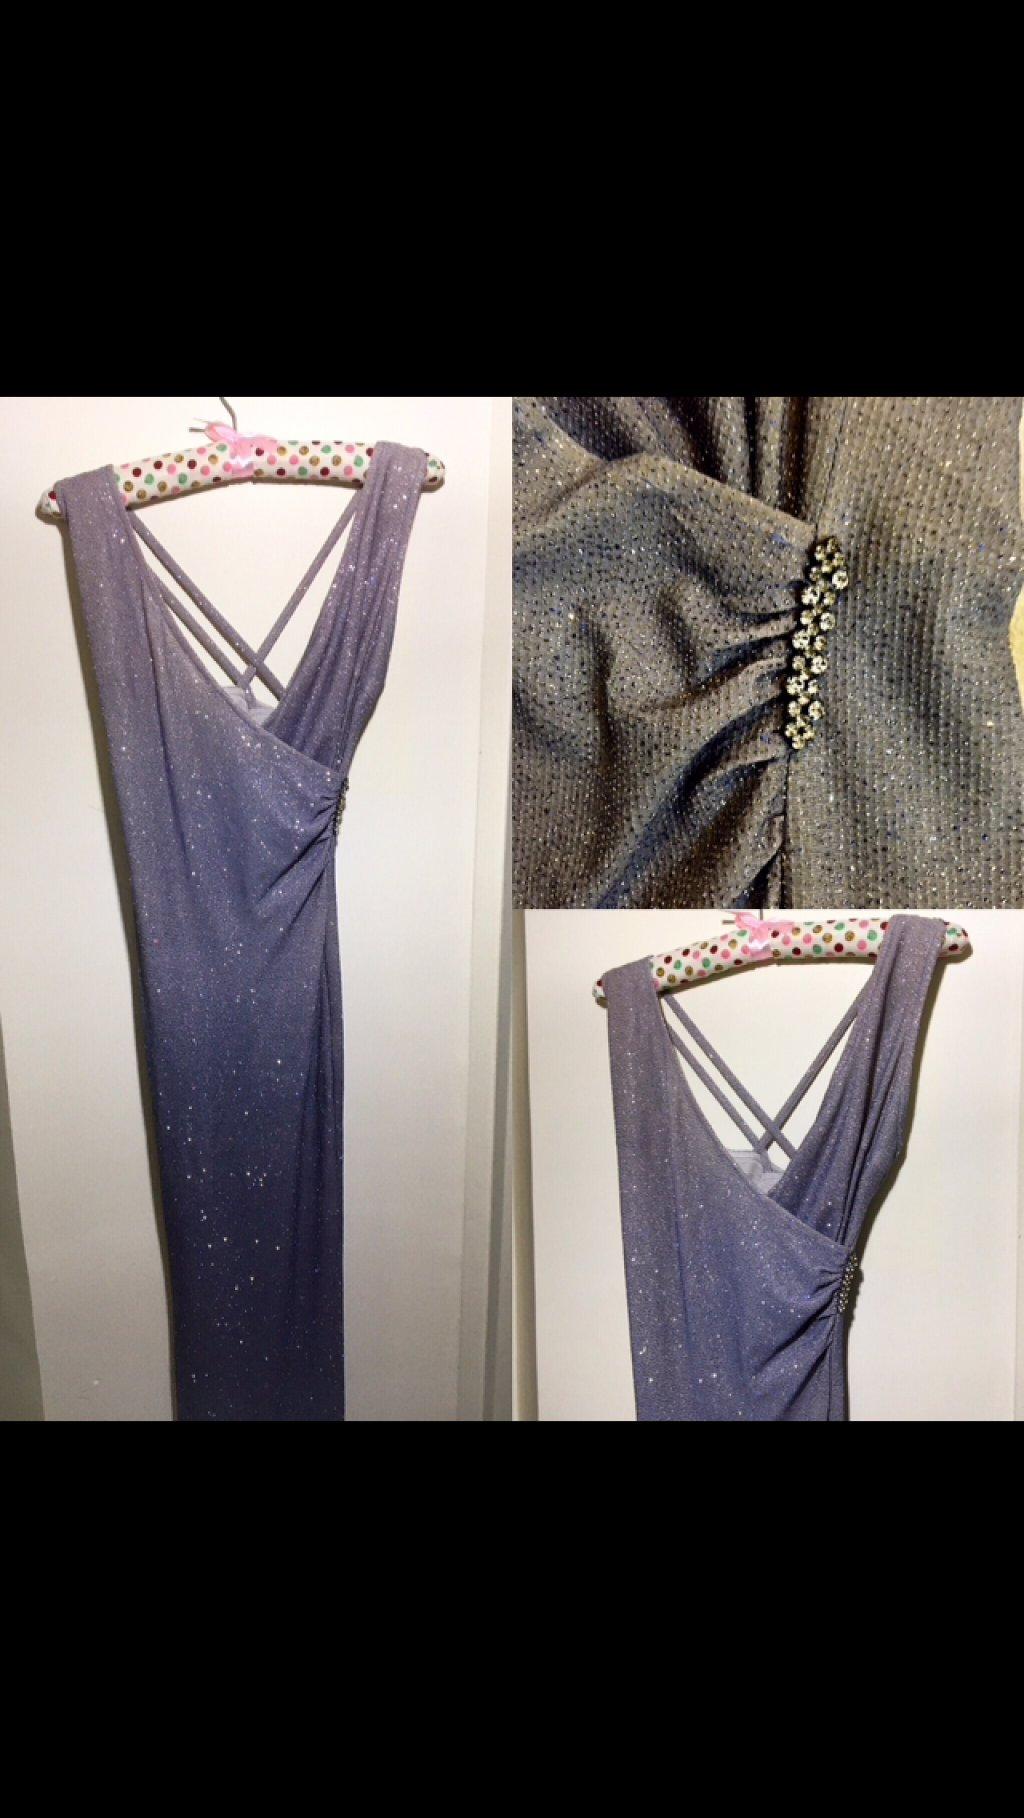 لباس شب تُرک اصل سایز ٣٦